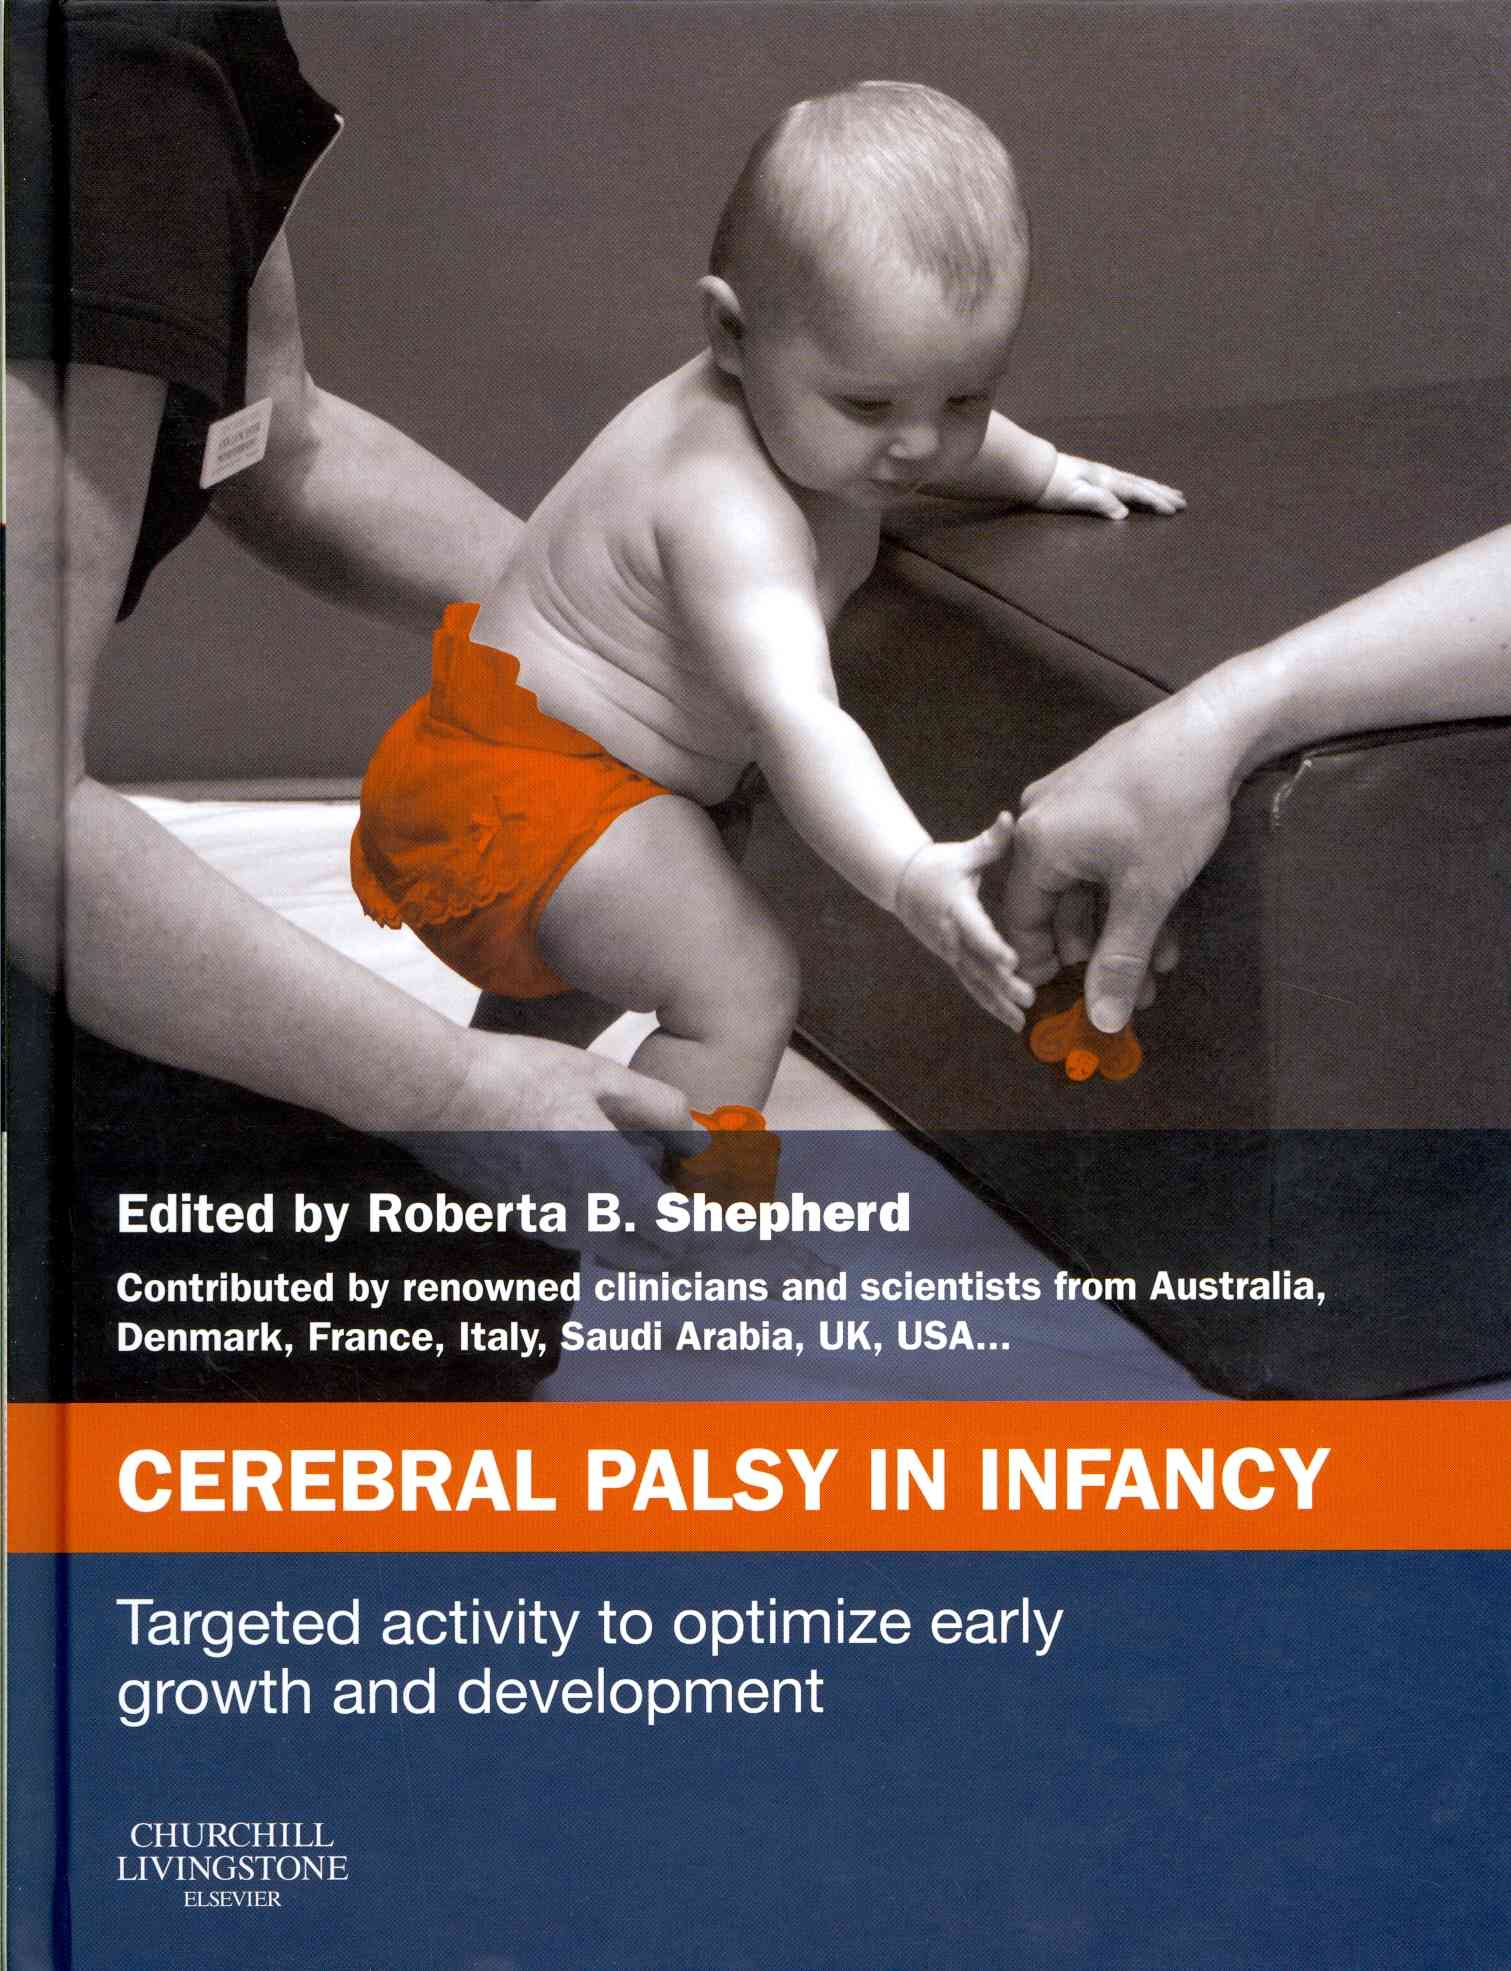 Cerebral Palsy in Infancy By Shepherd, Roberta B.